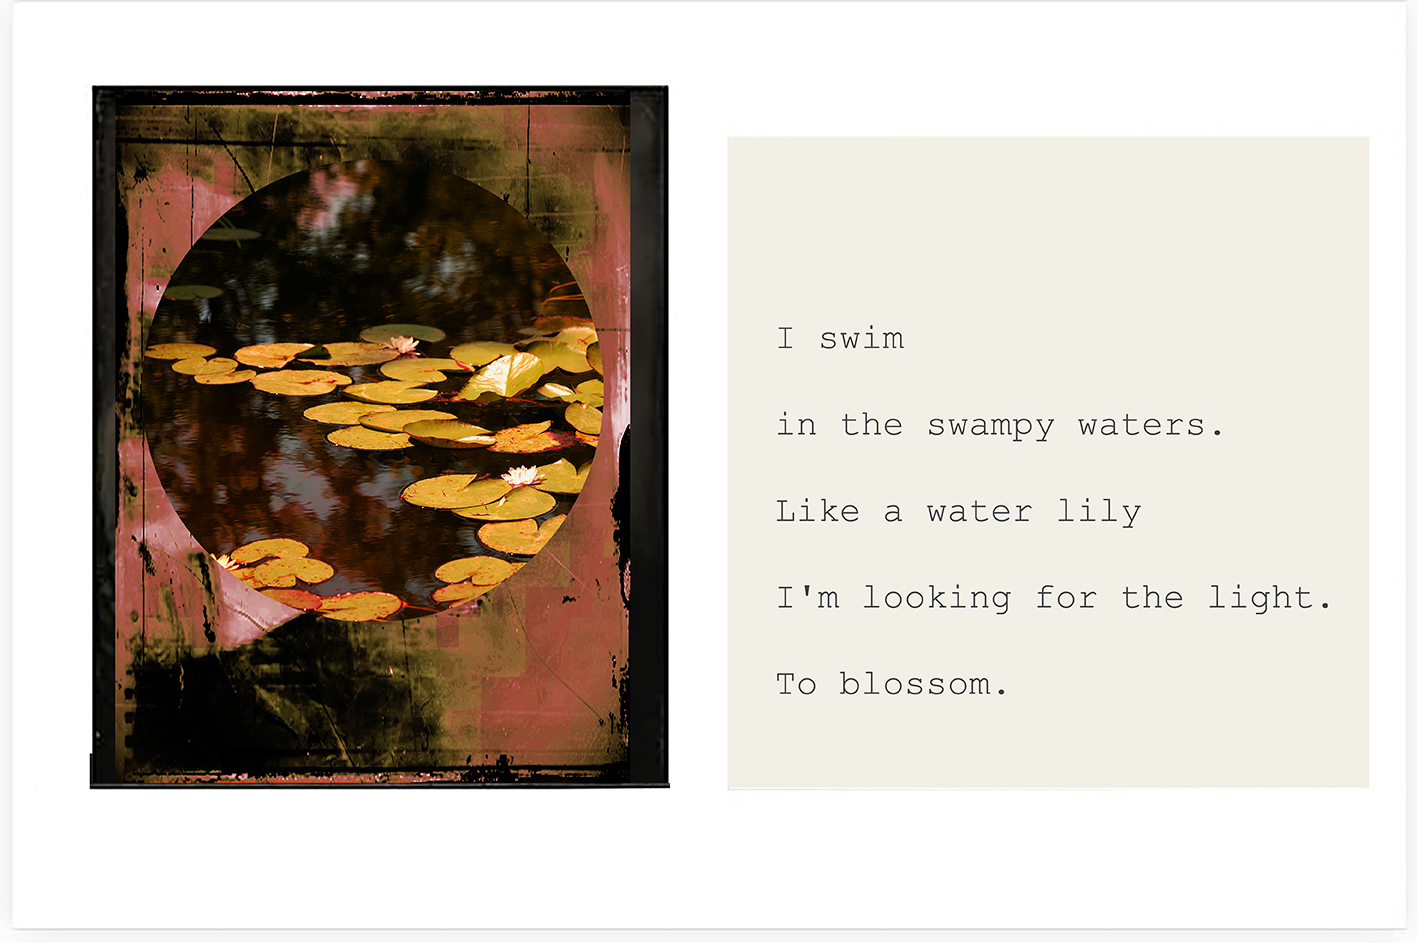 Monica_Gorini_Like a water lily 3.jpg